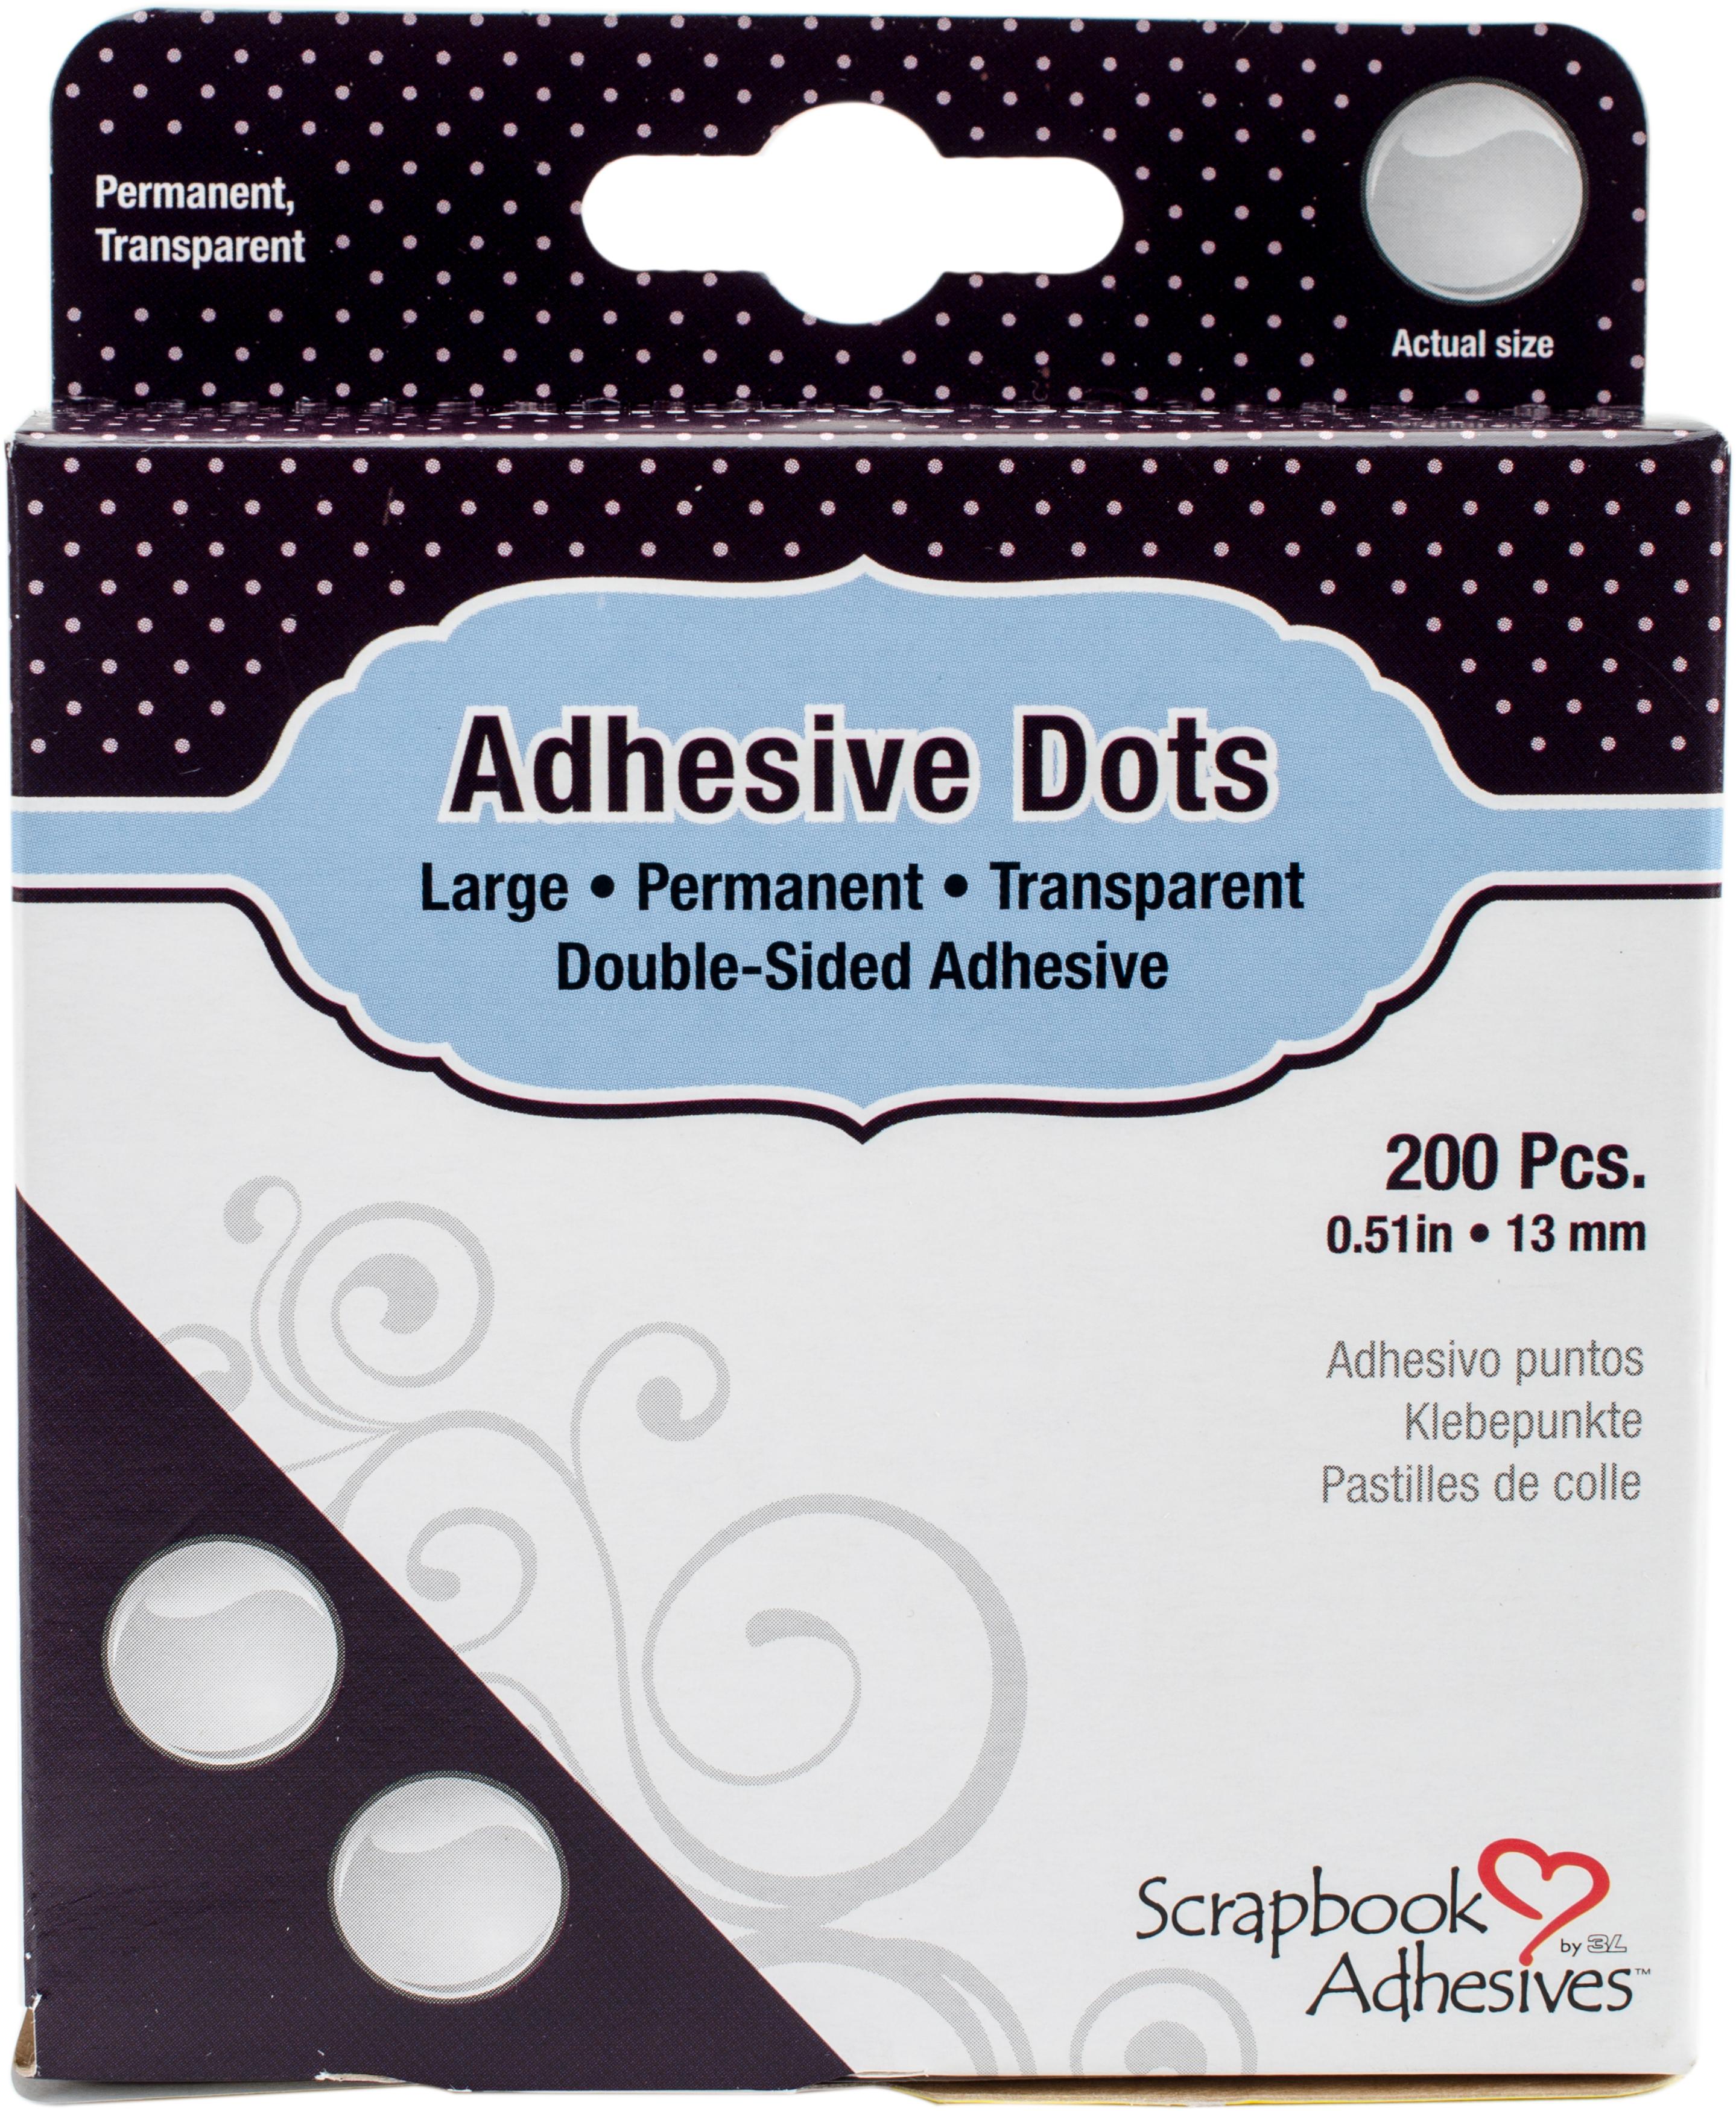 Scrapbook Adhesives Large Dots 200/Pkg-Permanent, .51